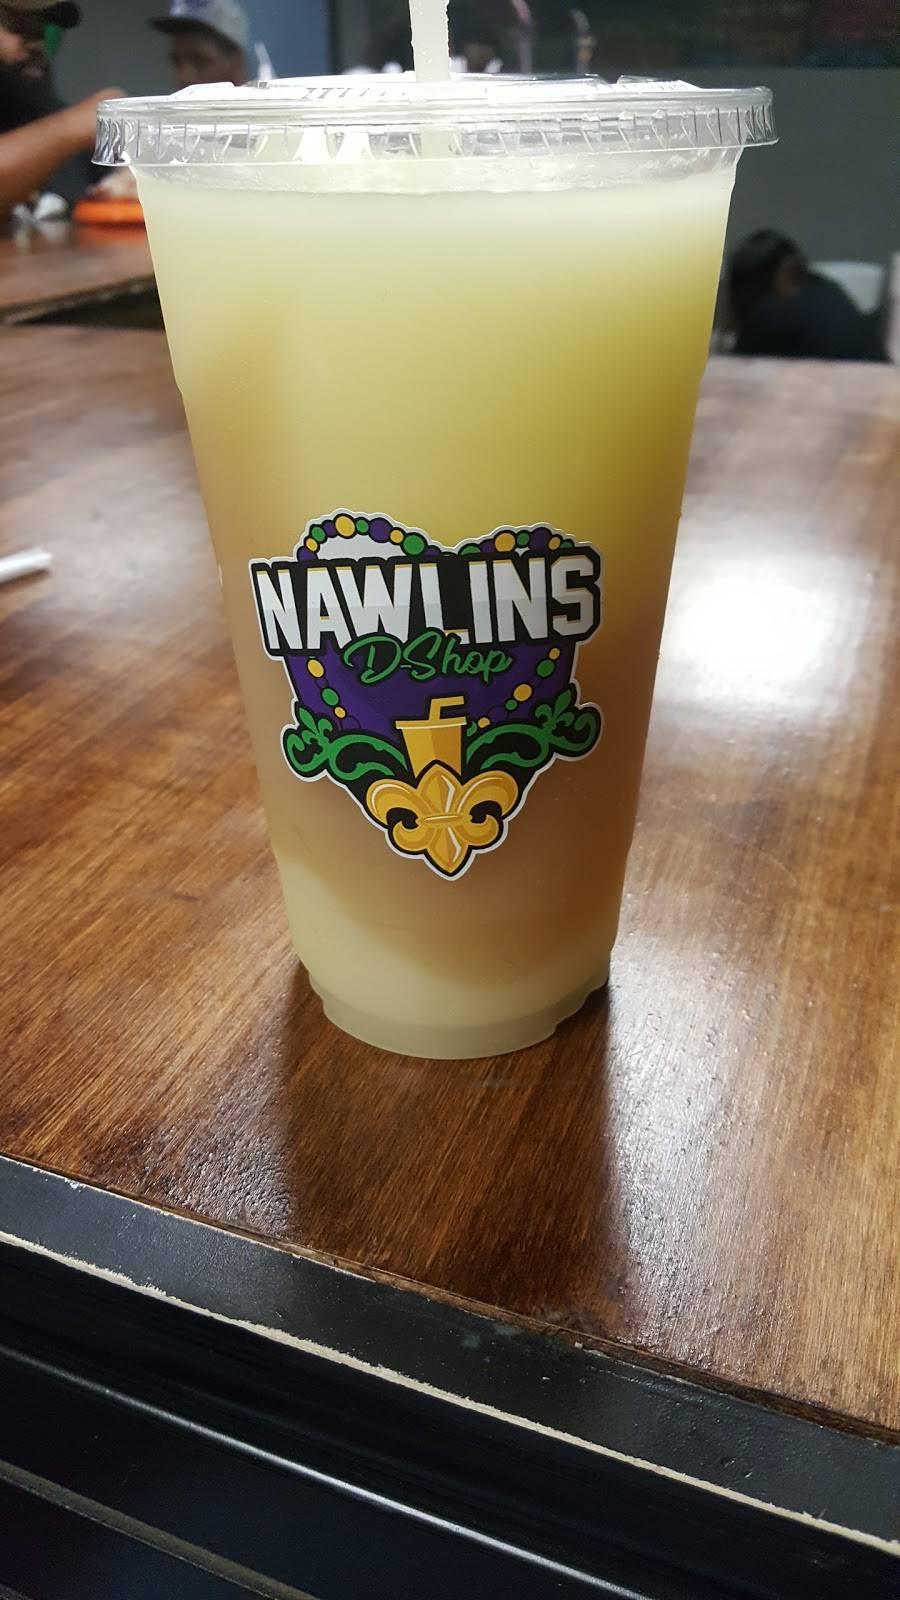 Nawlins Dshop | restaurant | 5828 Martin Luther King Blvd, Houston, TX 77021, USA | 7133067236 OR +1 713-306-7236